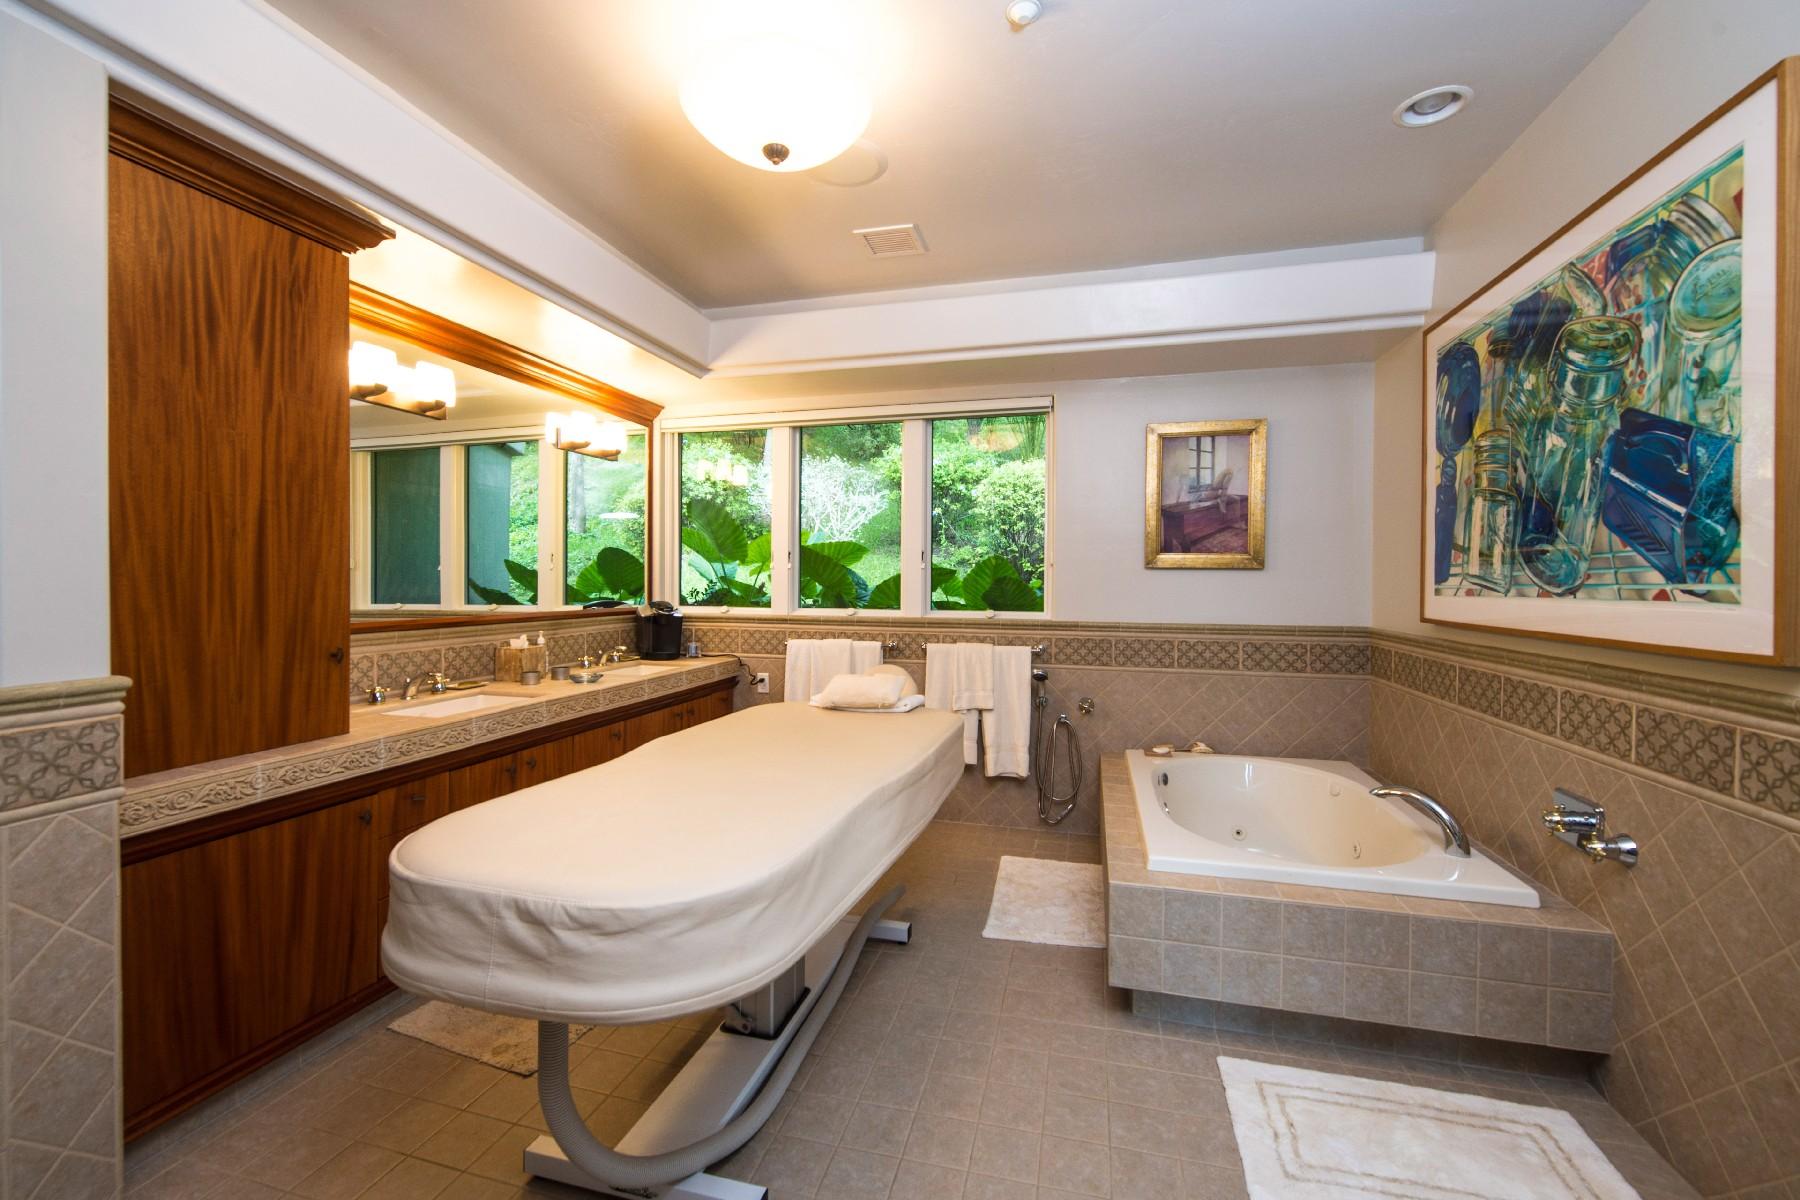 Additional photo for property listing at 5979 Rancho Diegueno  Rancho Santa Fe, California 92067 Estados Unidos